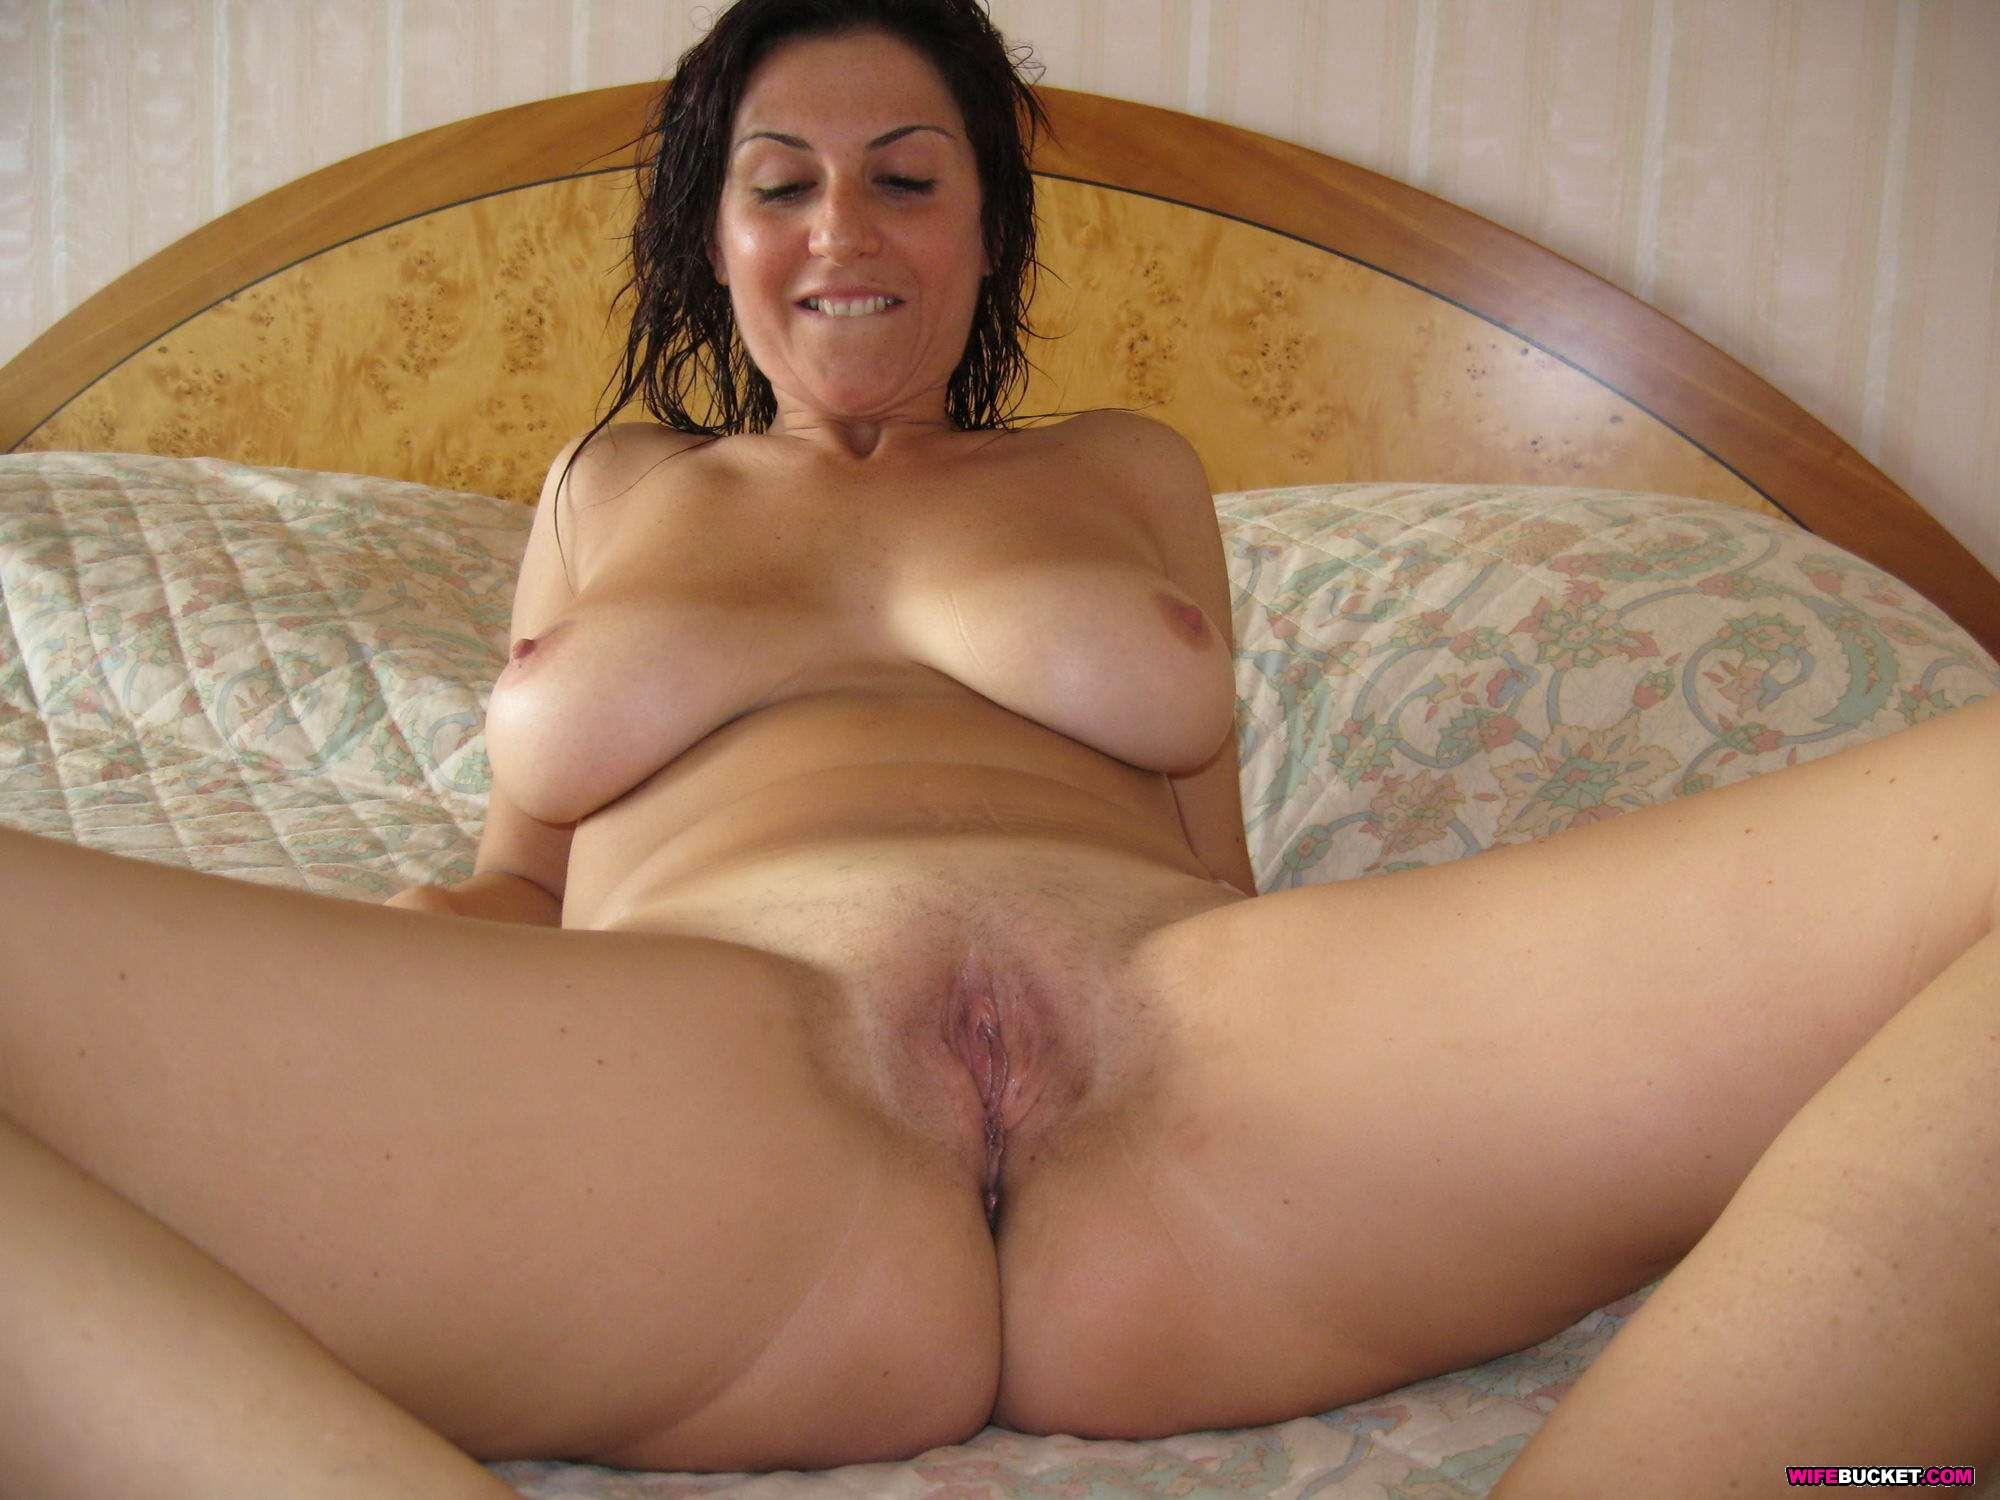 Skinny pretty girl nude